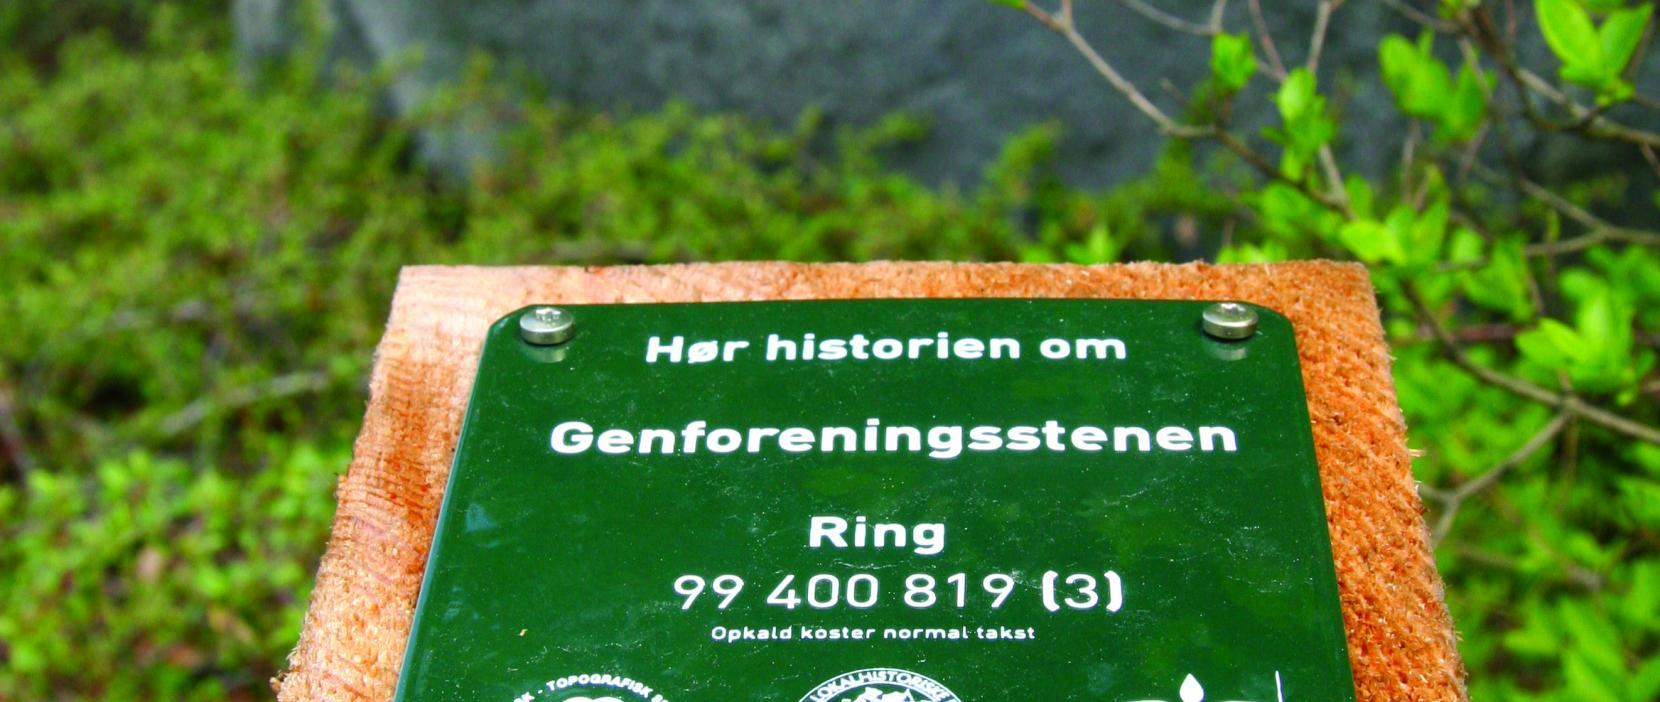 Foto: monumentpæl